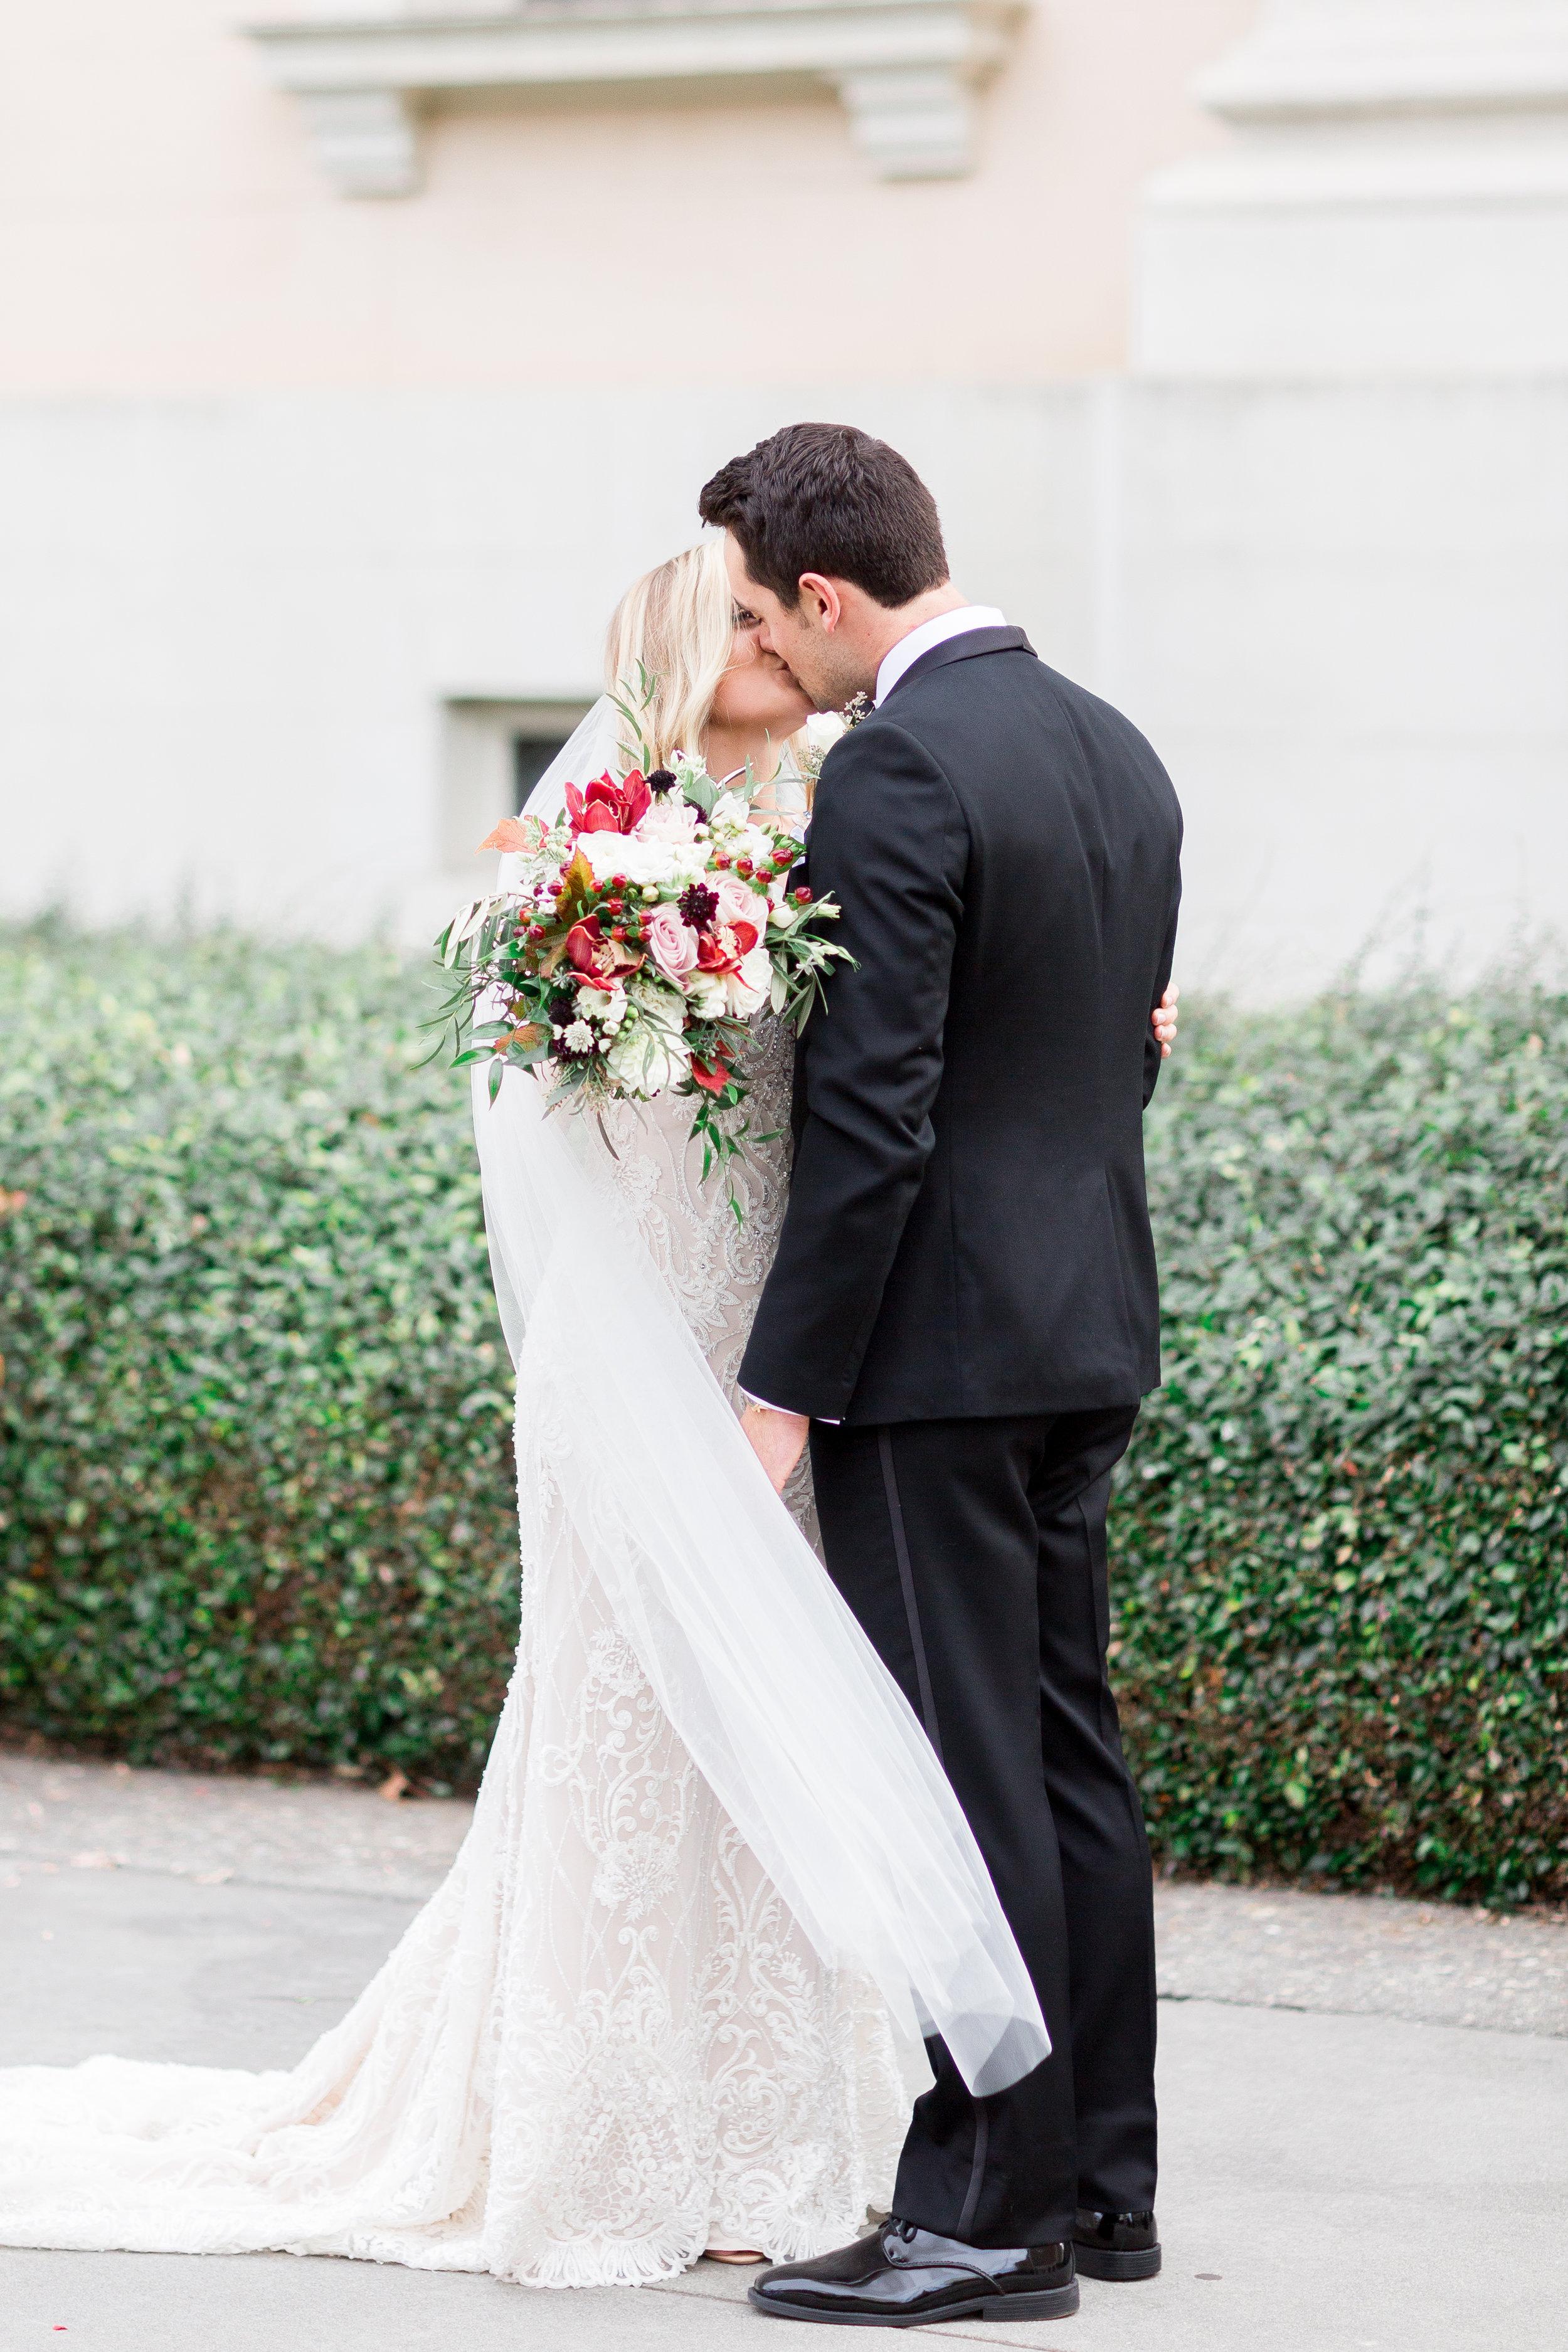 Downtown-San-Jose-wedding-photographer (36 of 335).jpg